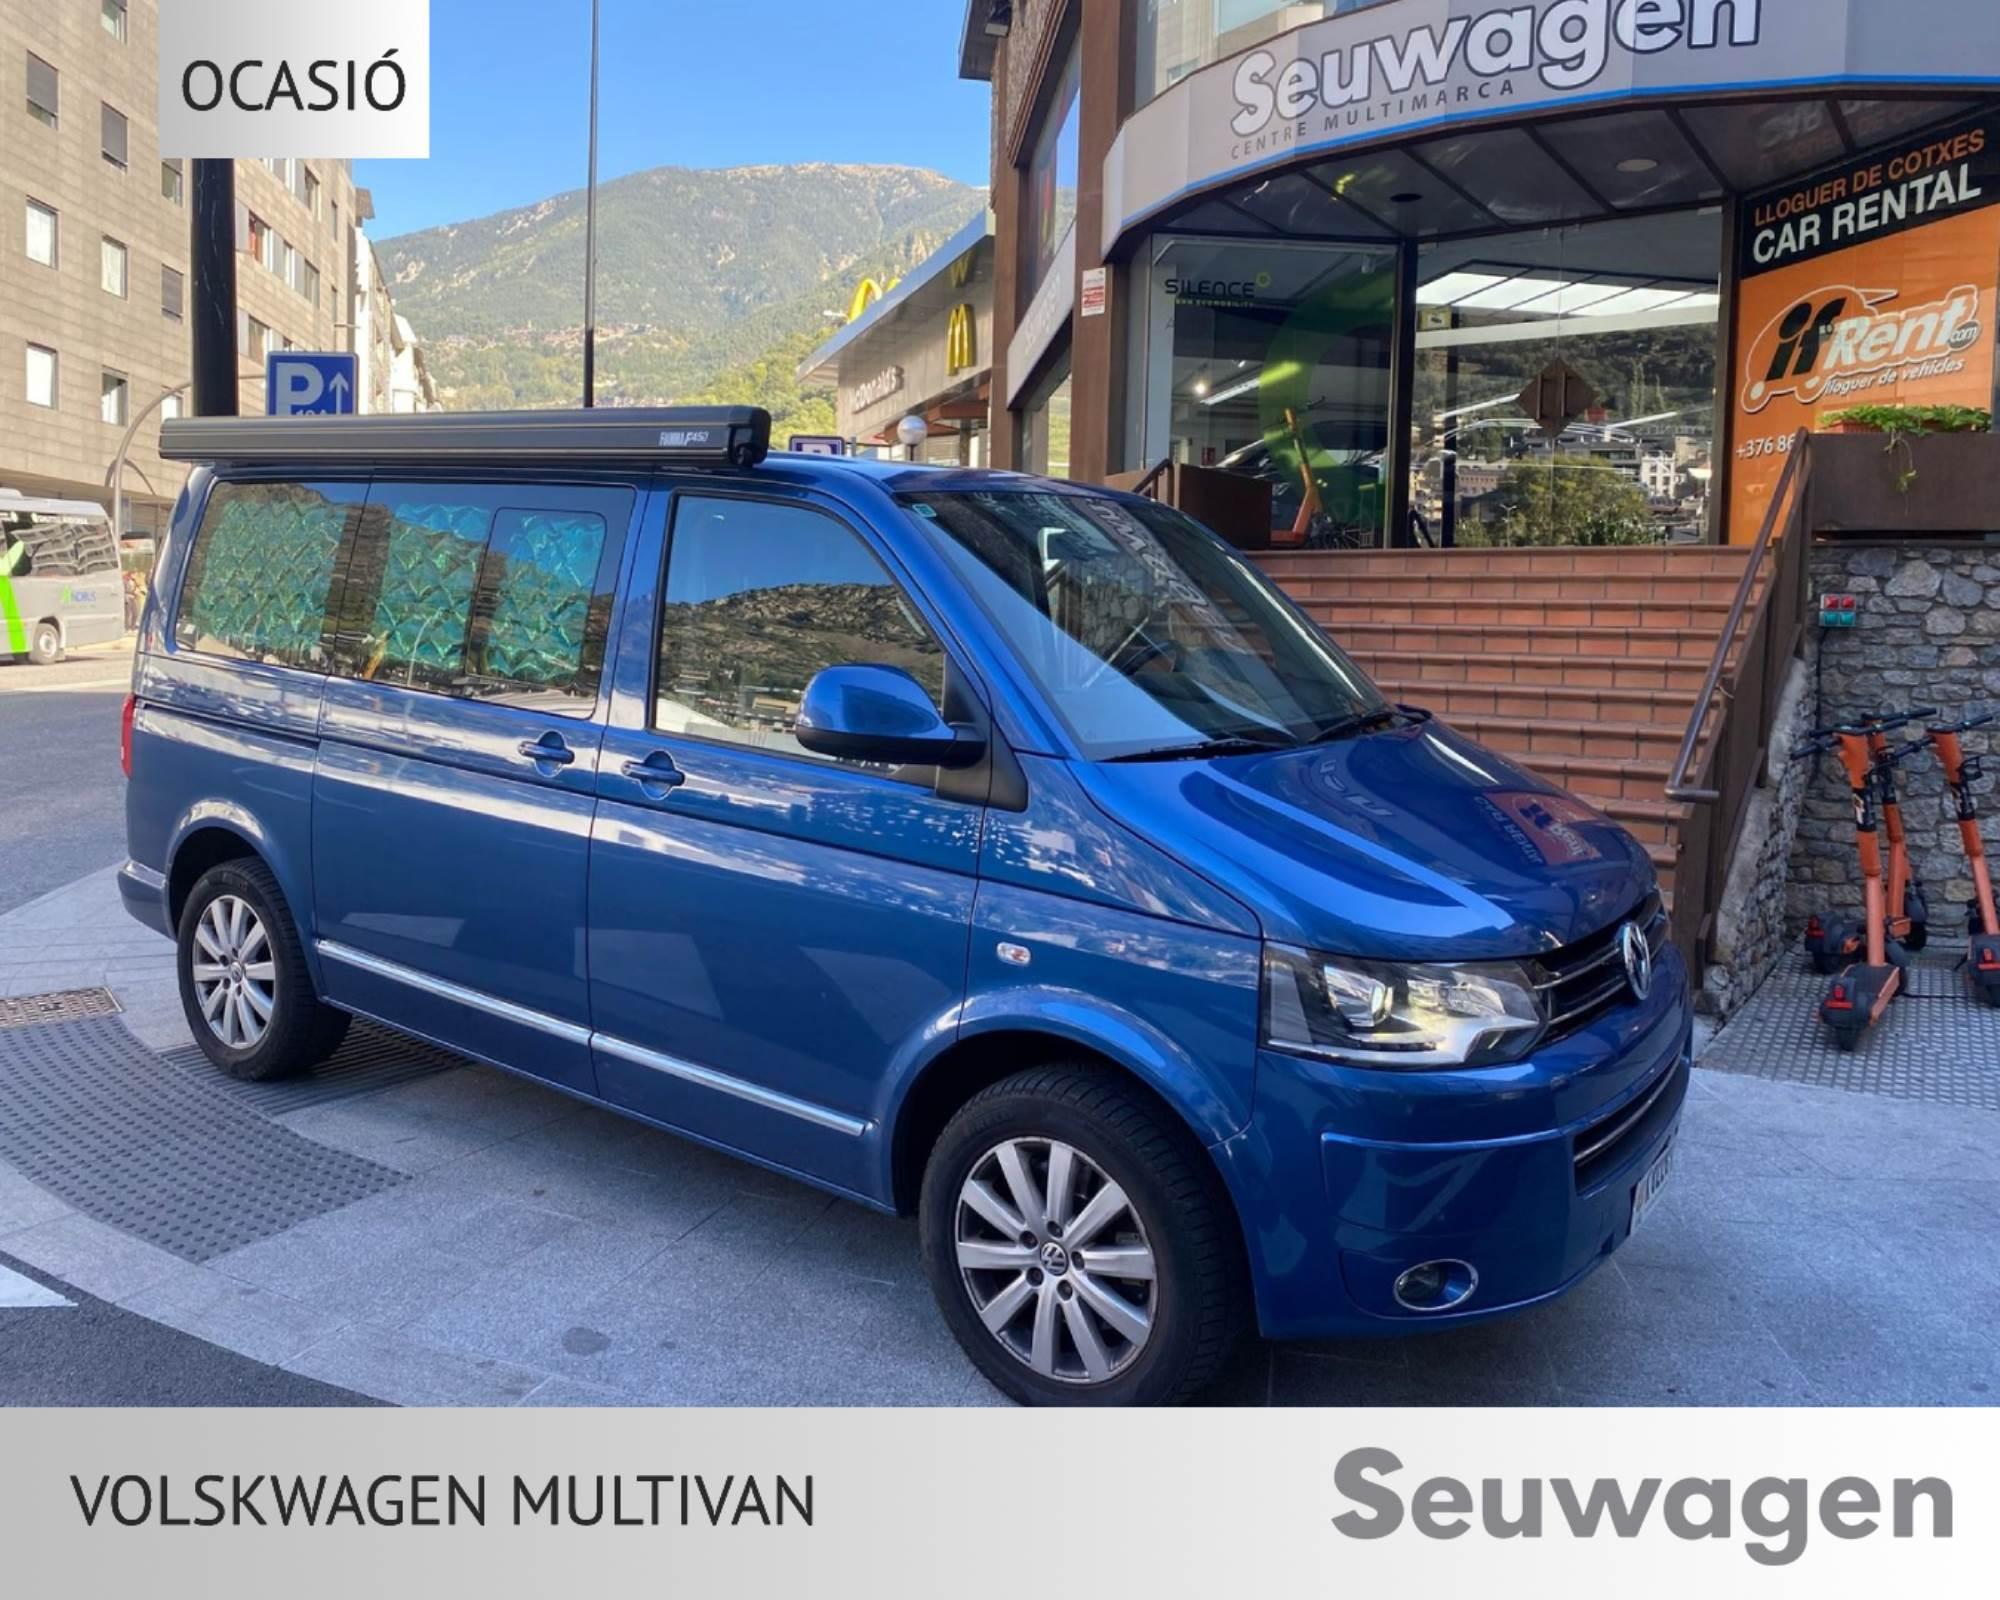 Volkswagen - Multivan T6 - 4 MOTION 4 MOTION Dièsel  2014  130.000 Km